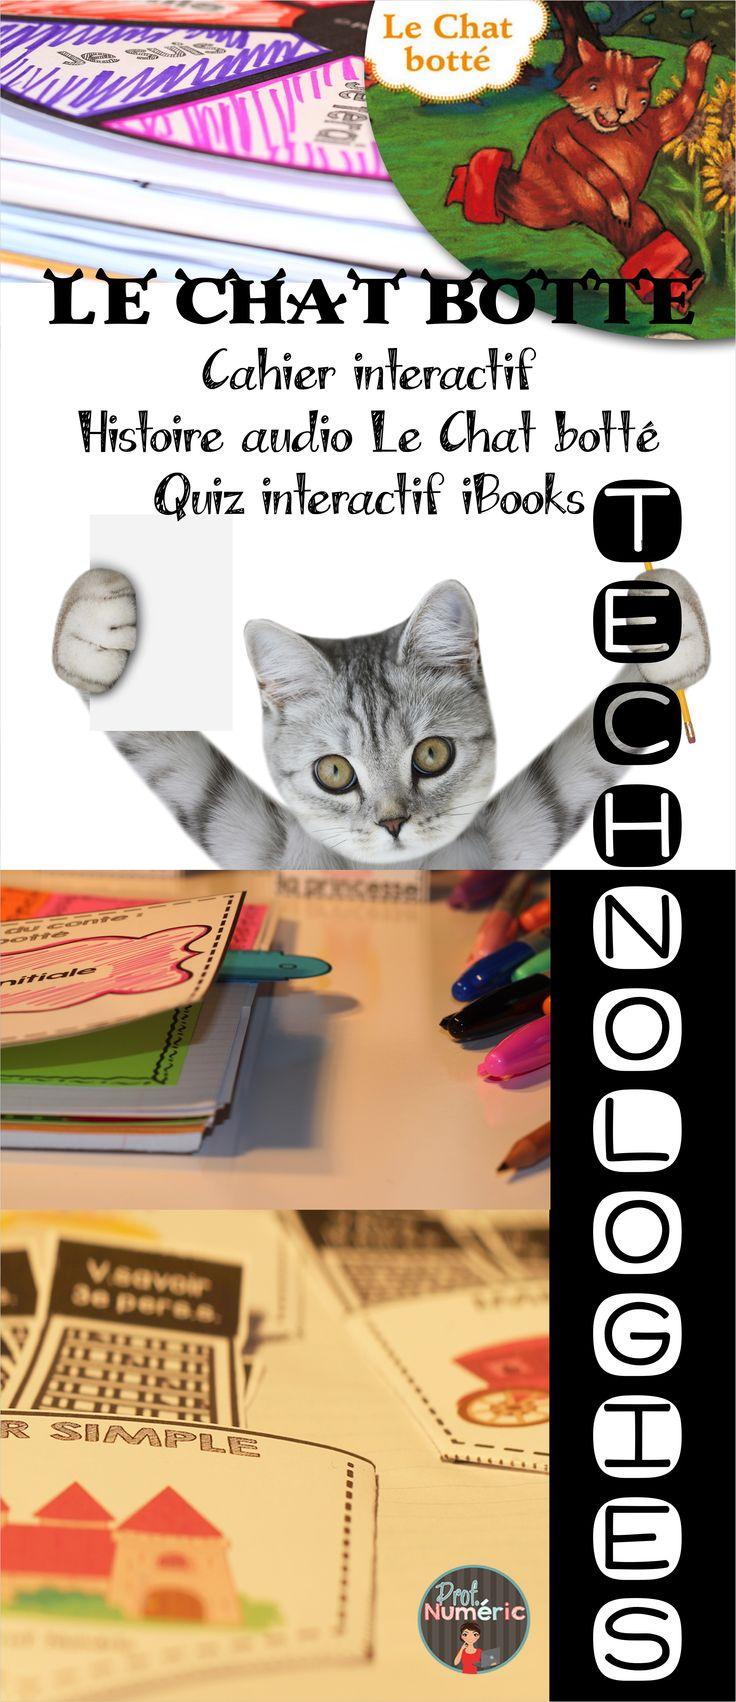 Essential vocabulary words for hotel housekeeping fluentu english - Cahier Interactif Du Chat Bott Avec Un Quiz Interactif Sur Ipad Ibooks En Plus